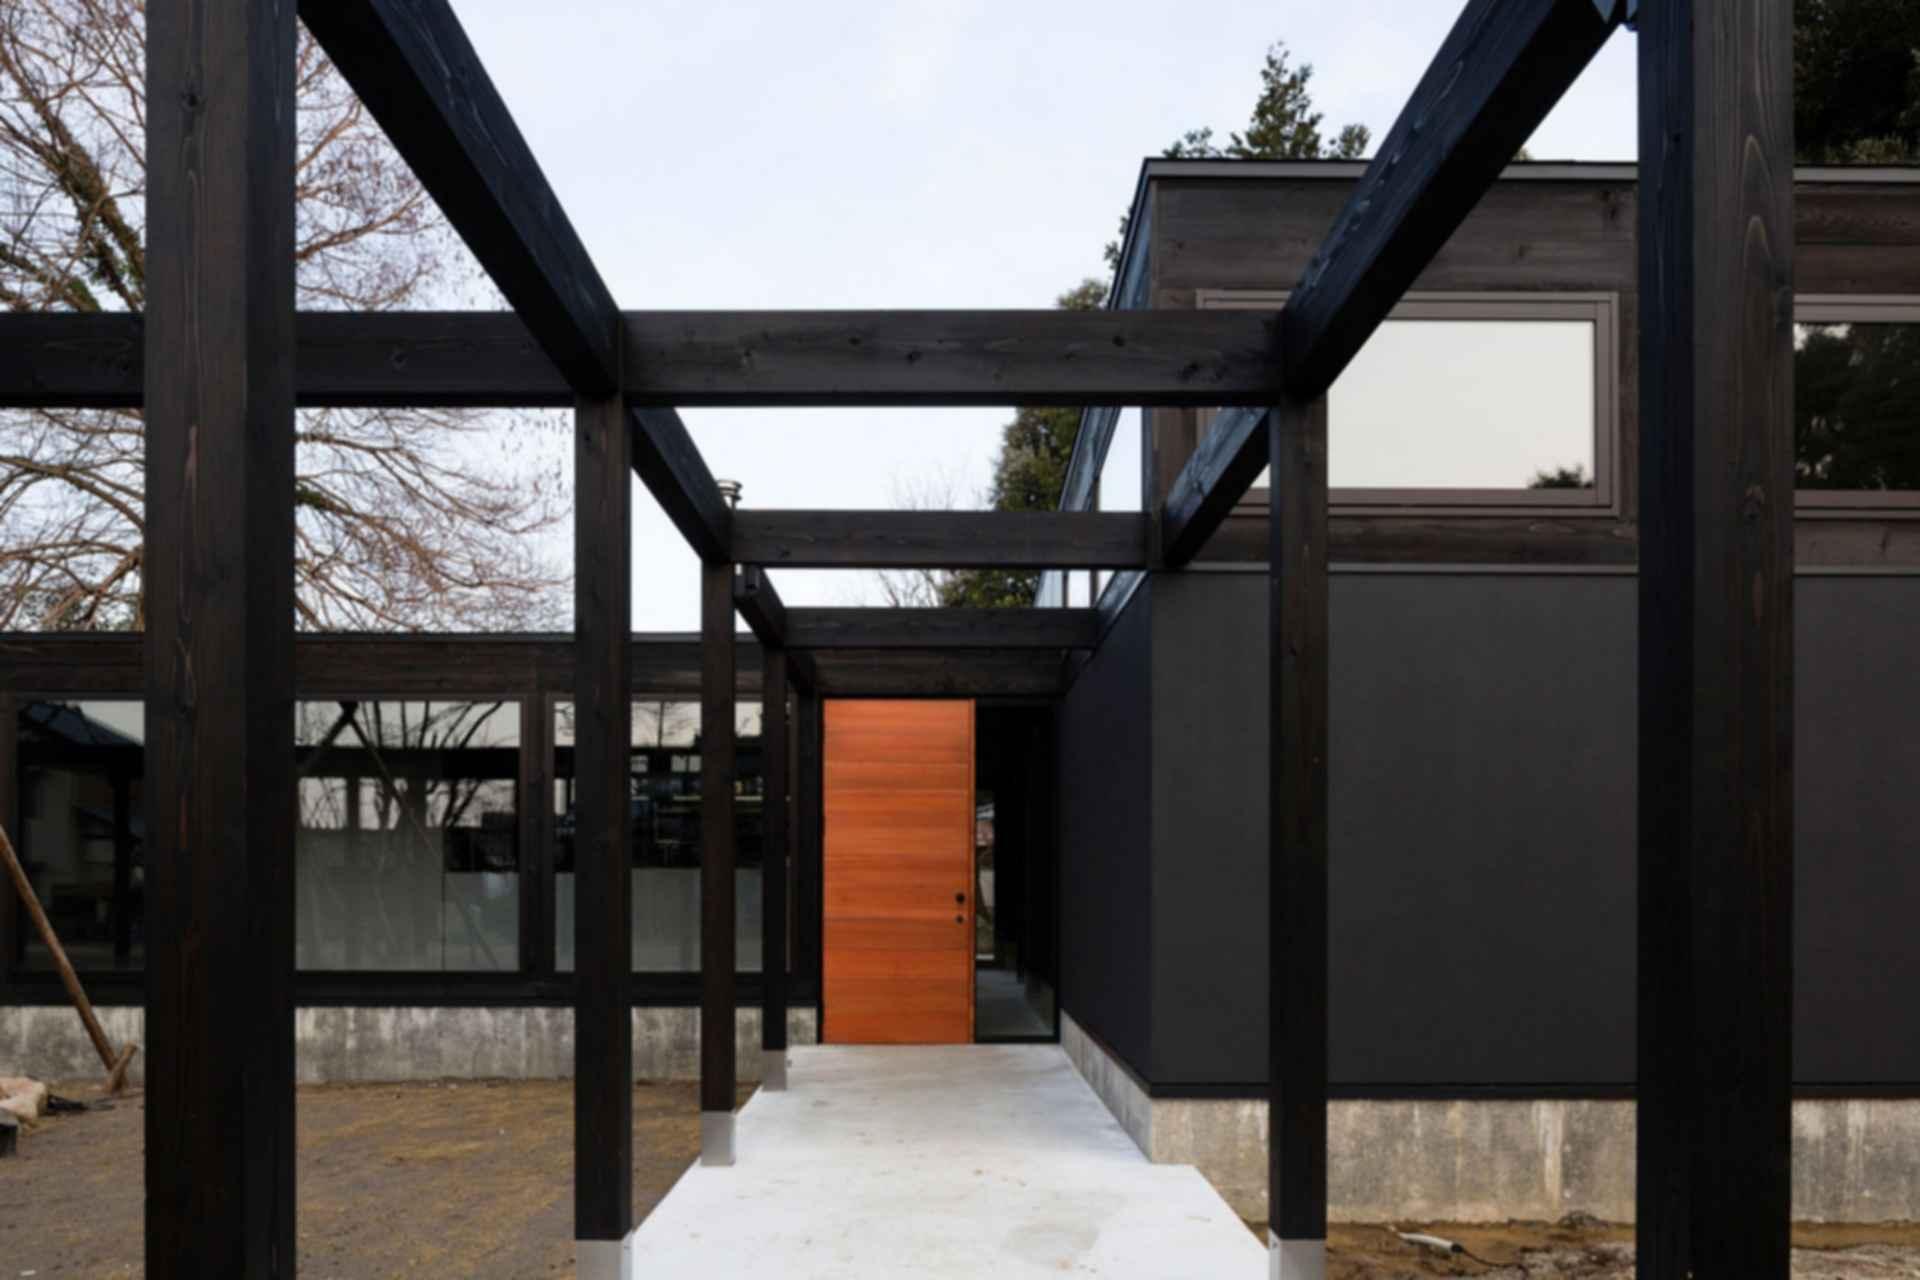 Plate - exterior/entrance